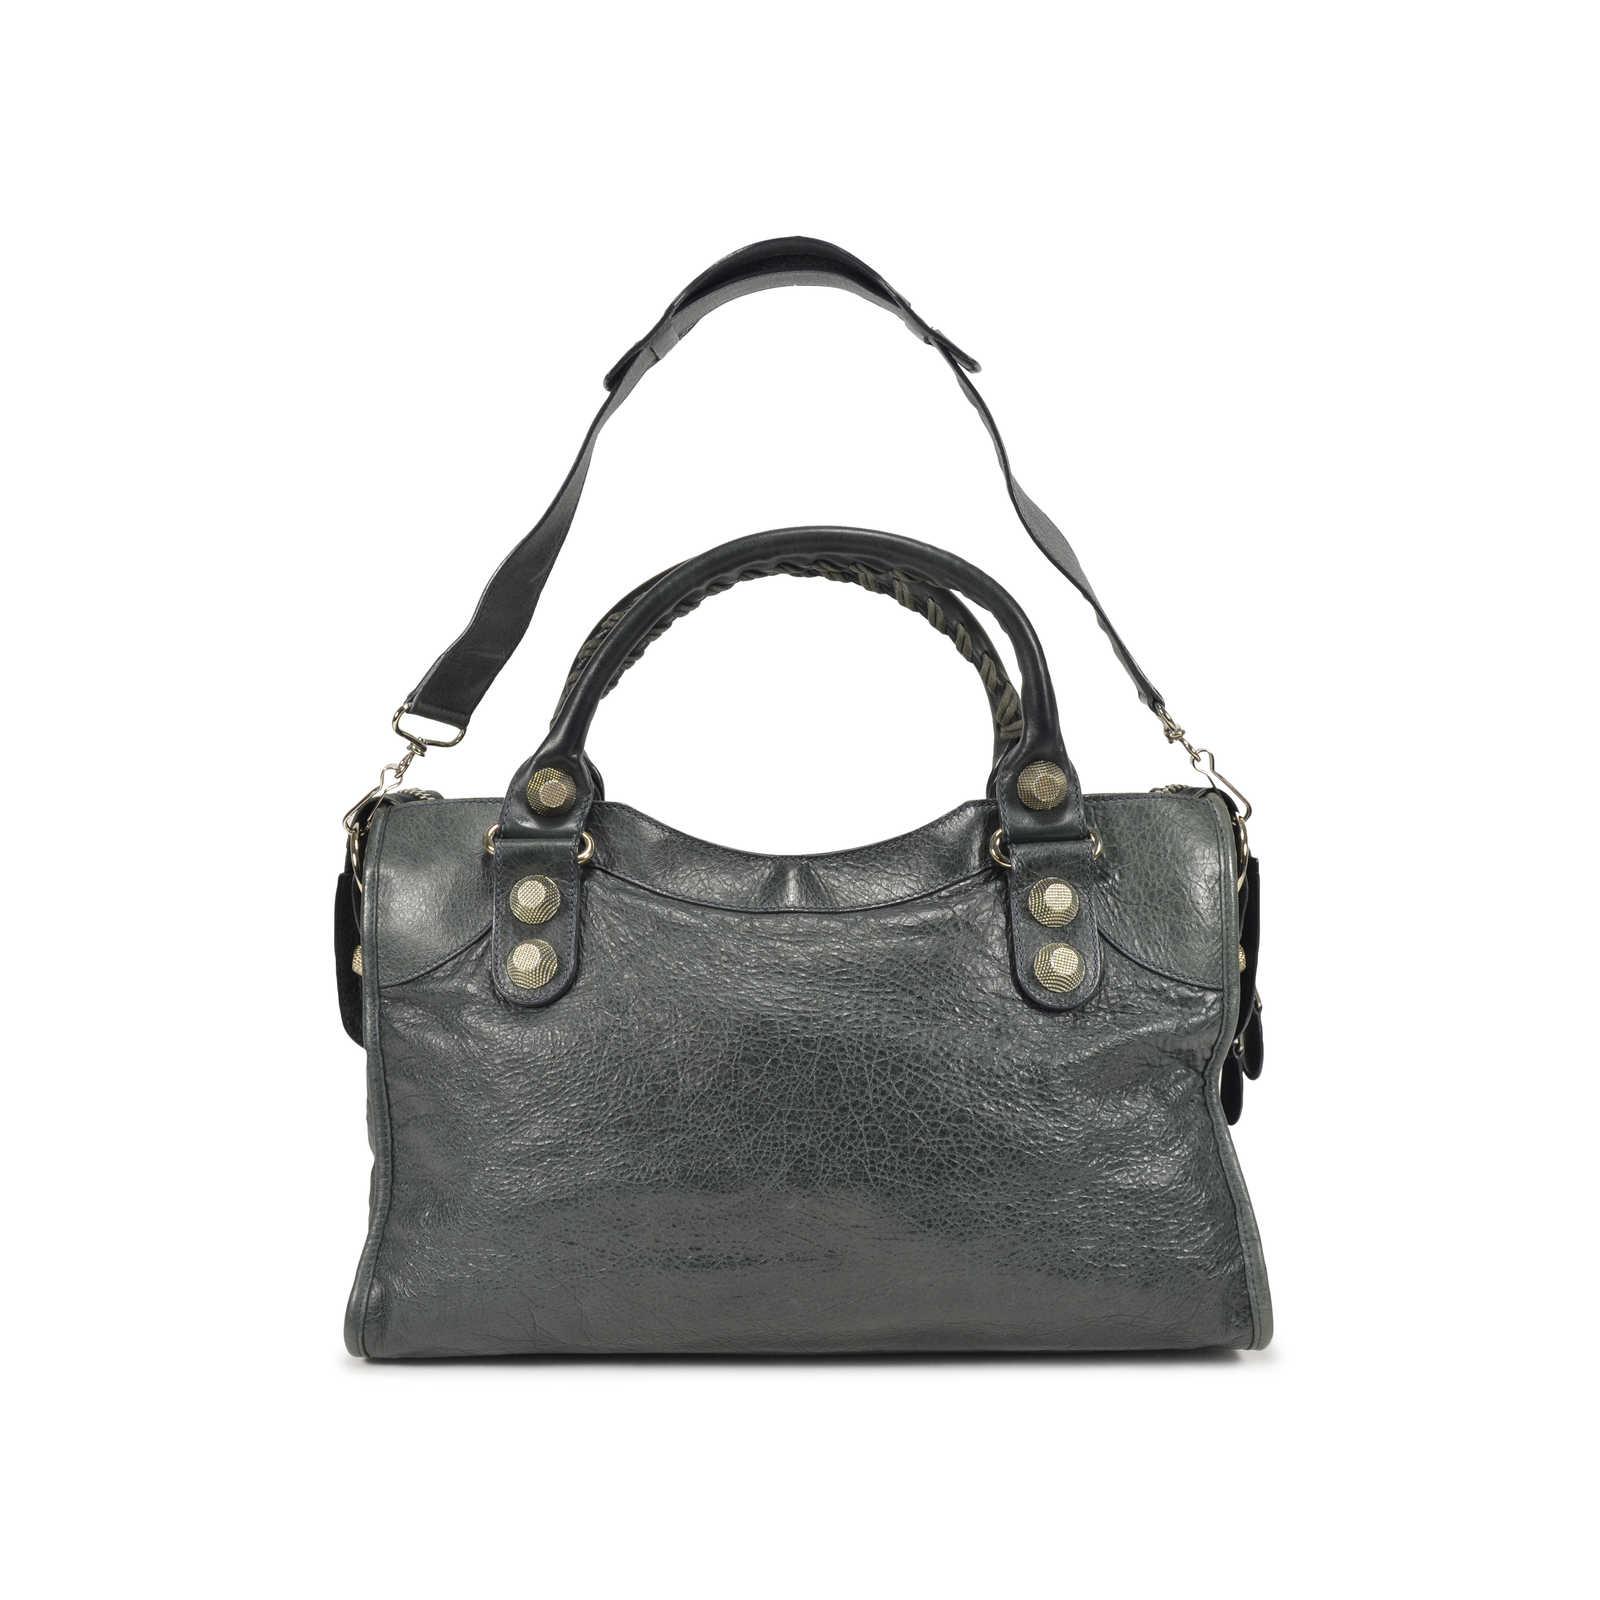 d9dd903e6f9e ... Authentic Second Hand Balenciaga Giant City Anthracite Bag  (PSS-021-00013) ...